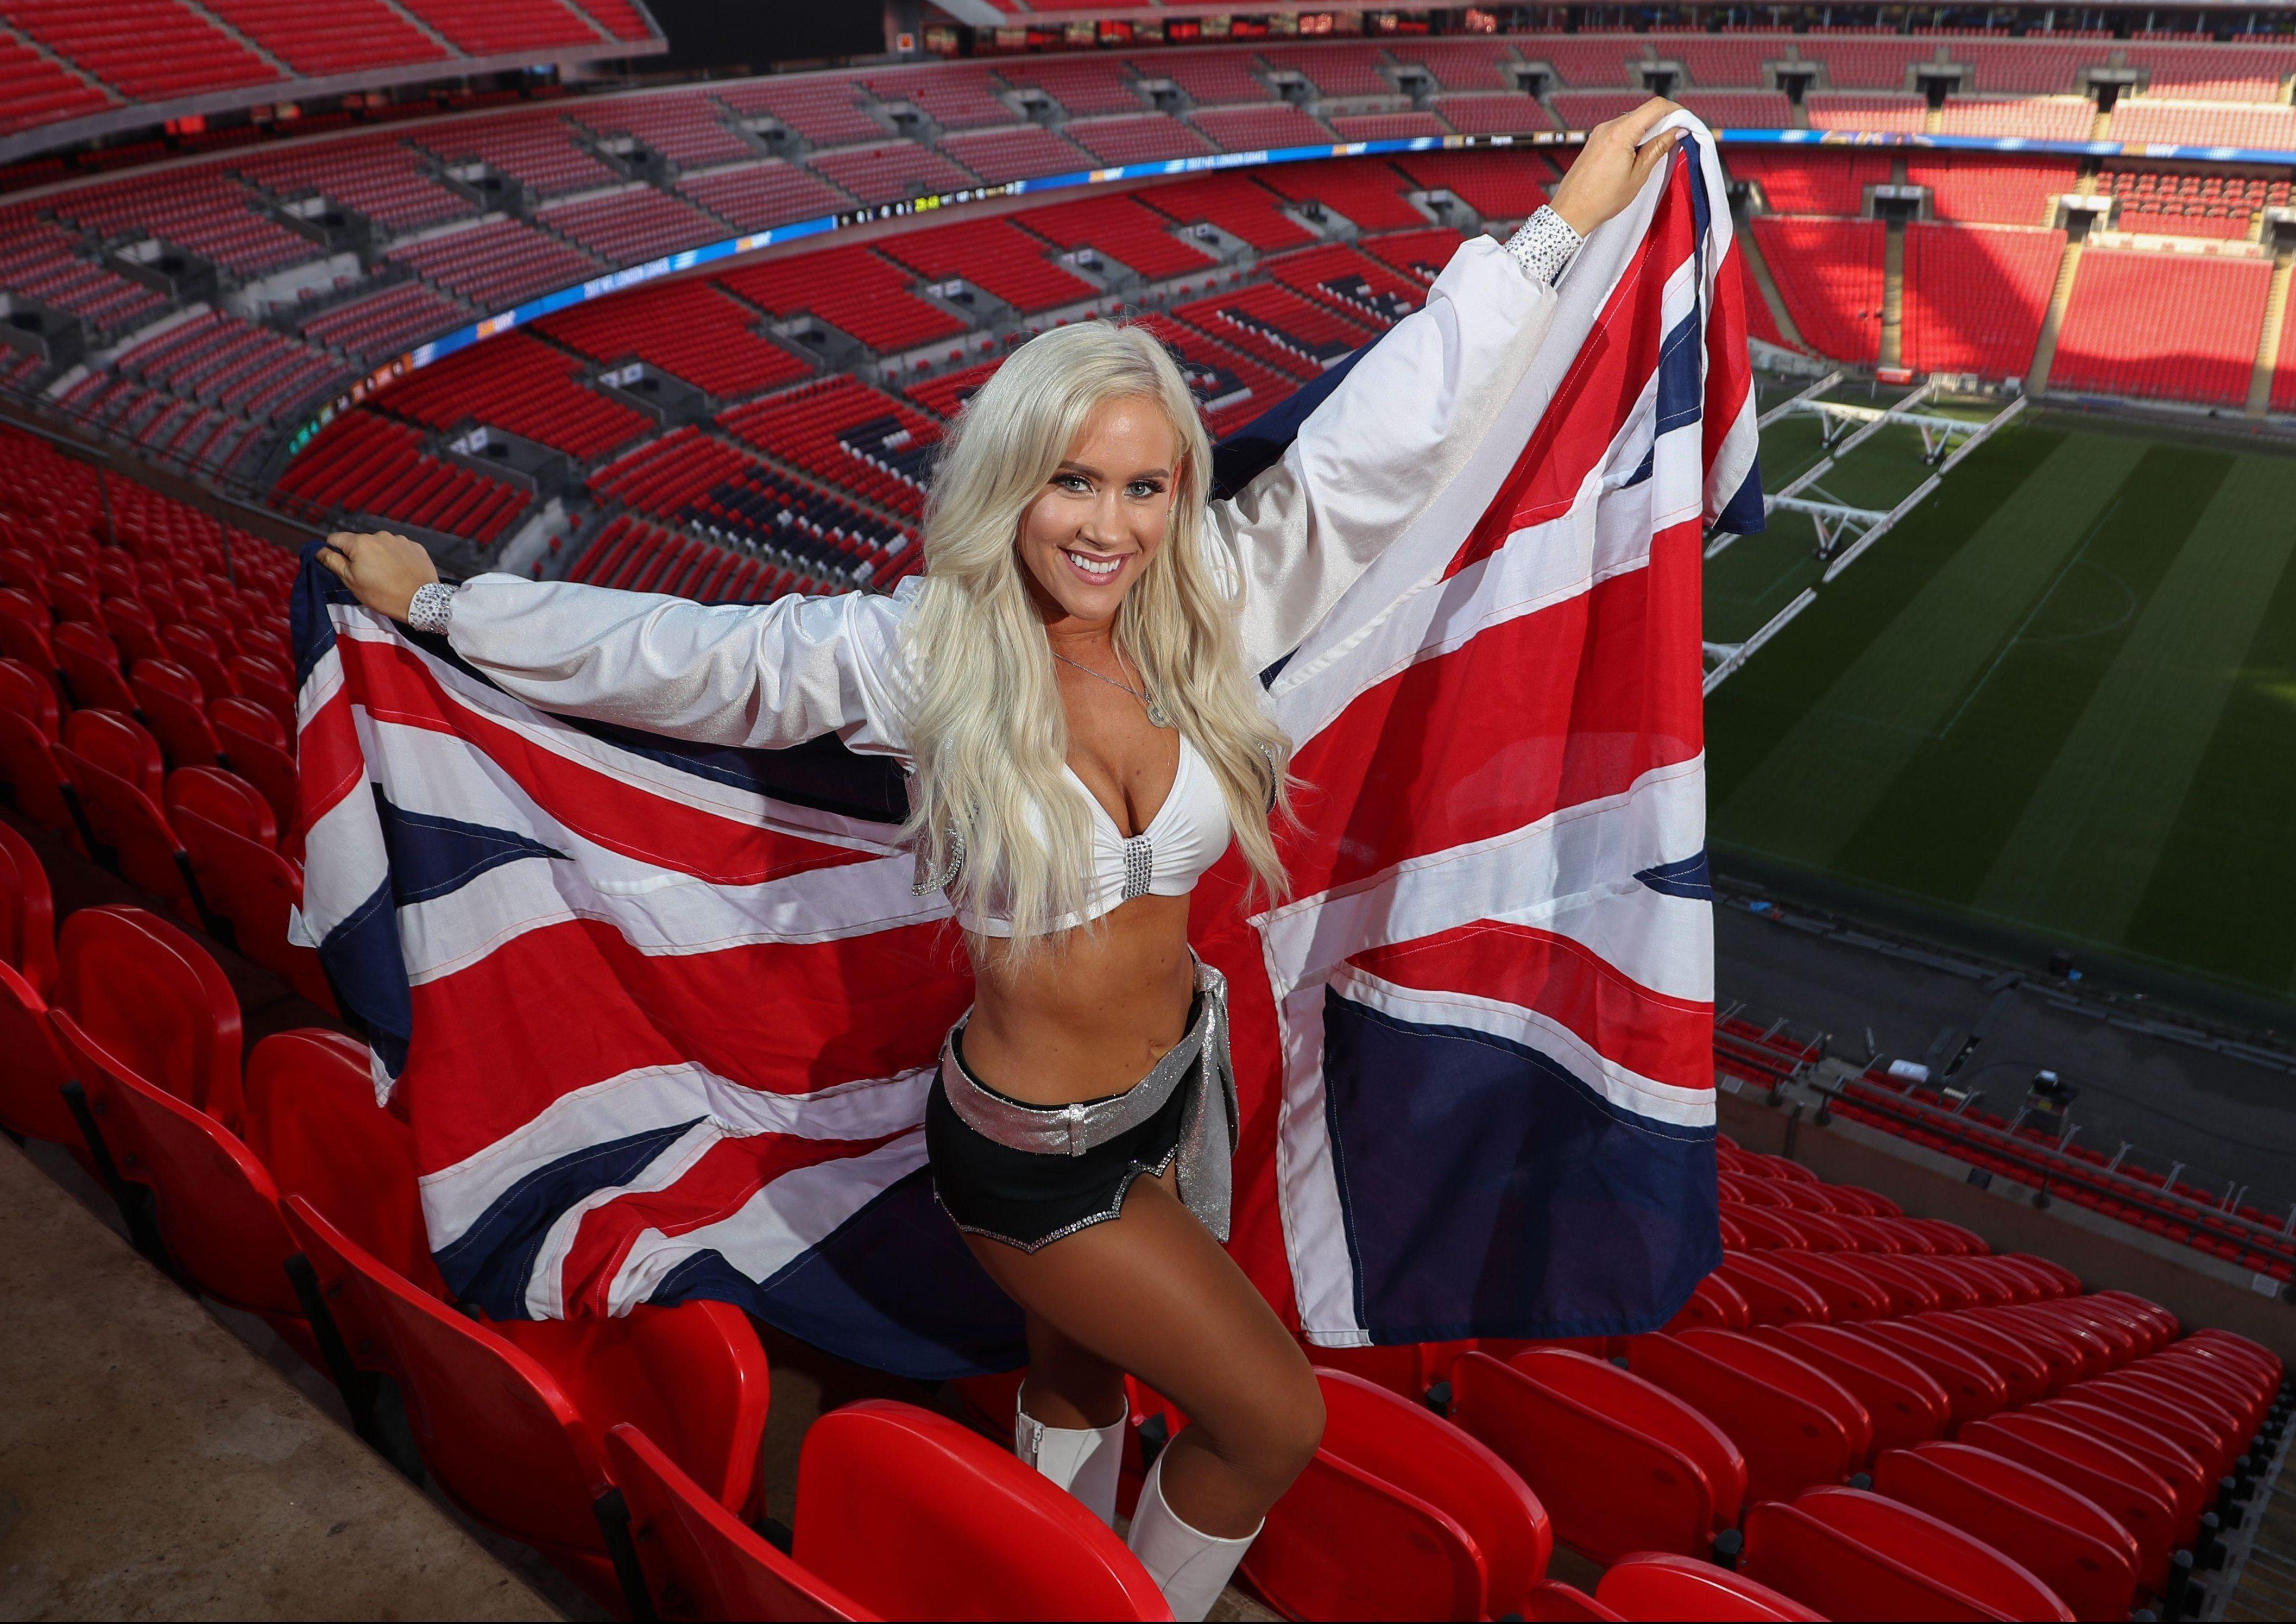 Oakland Raiders cheerleaders light up Wembley